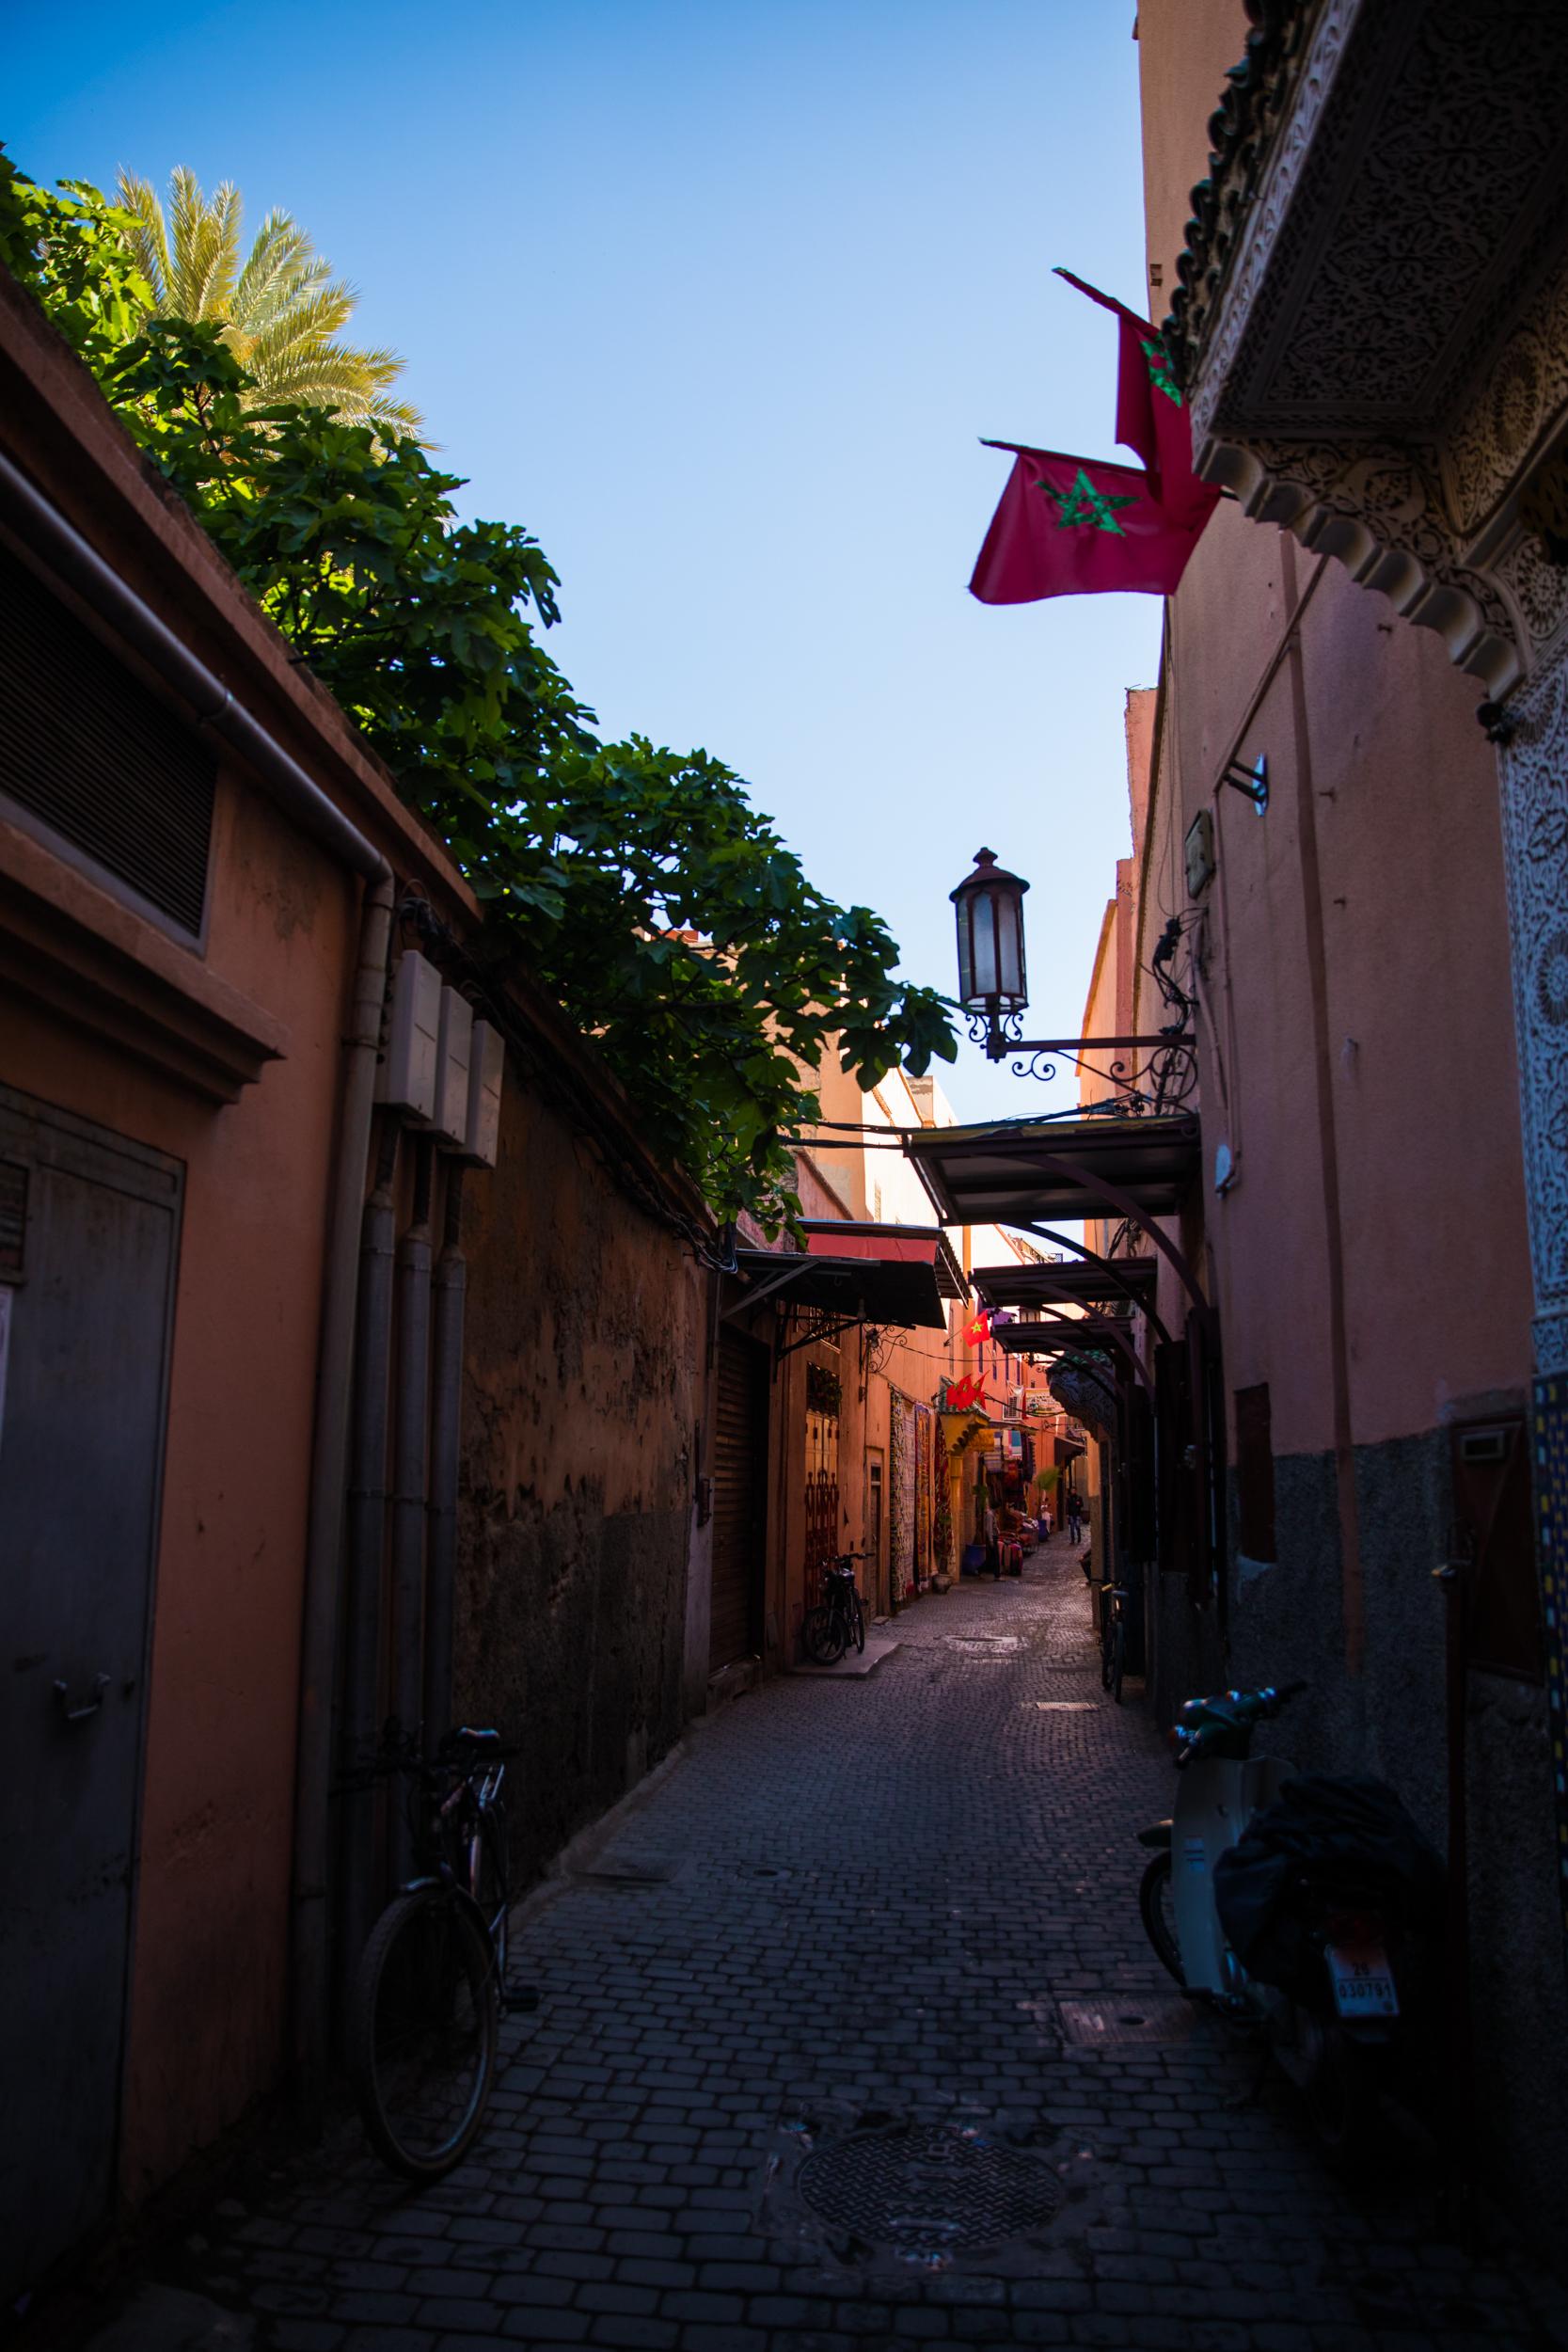 Colin_Herrington_Maroc_Stories-7.jpg